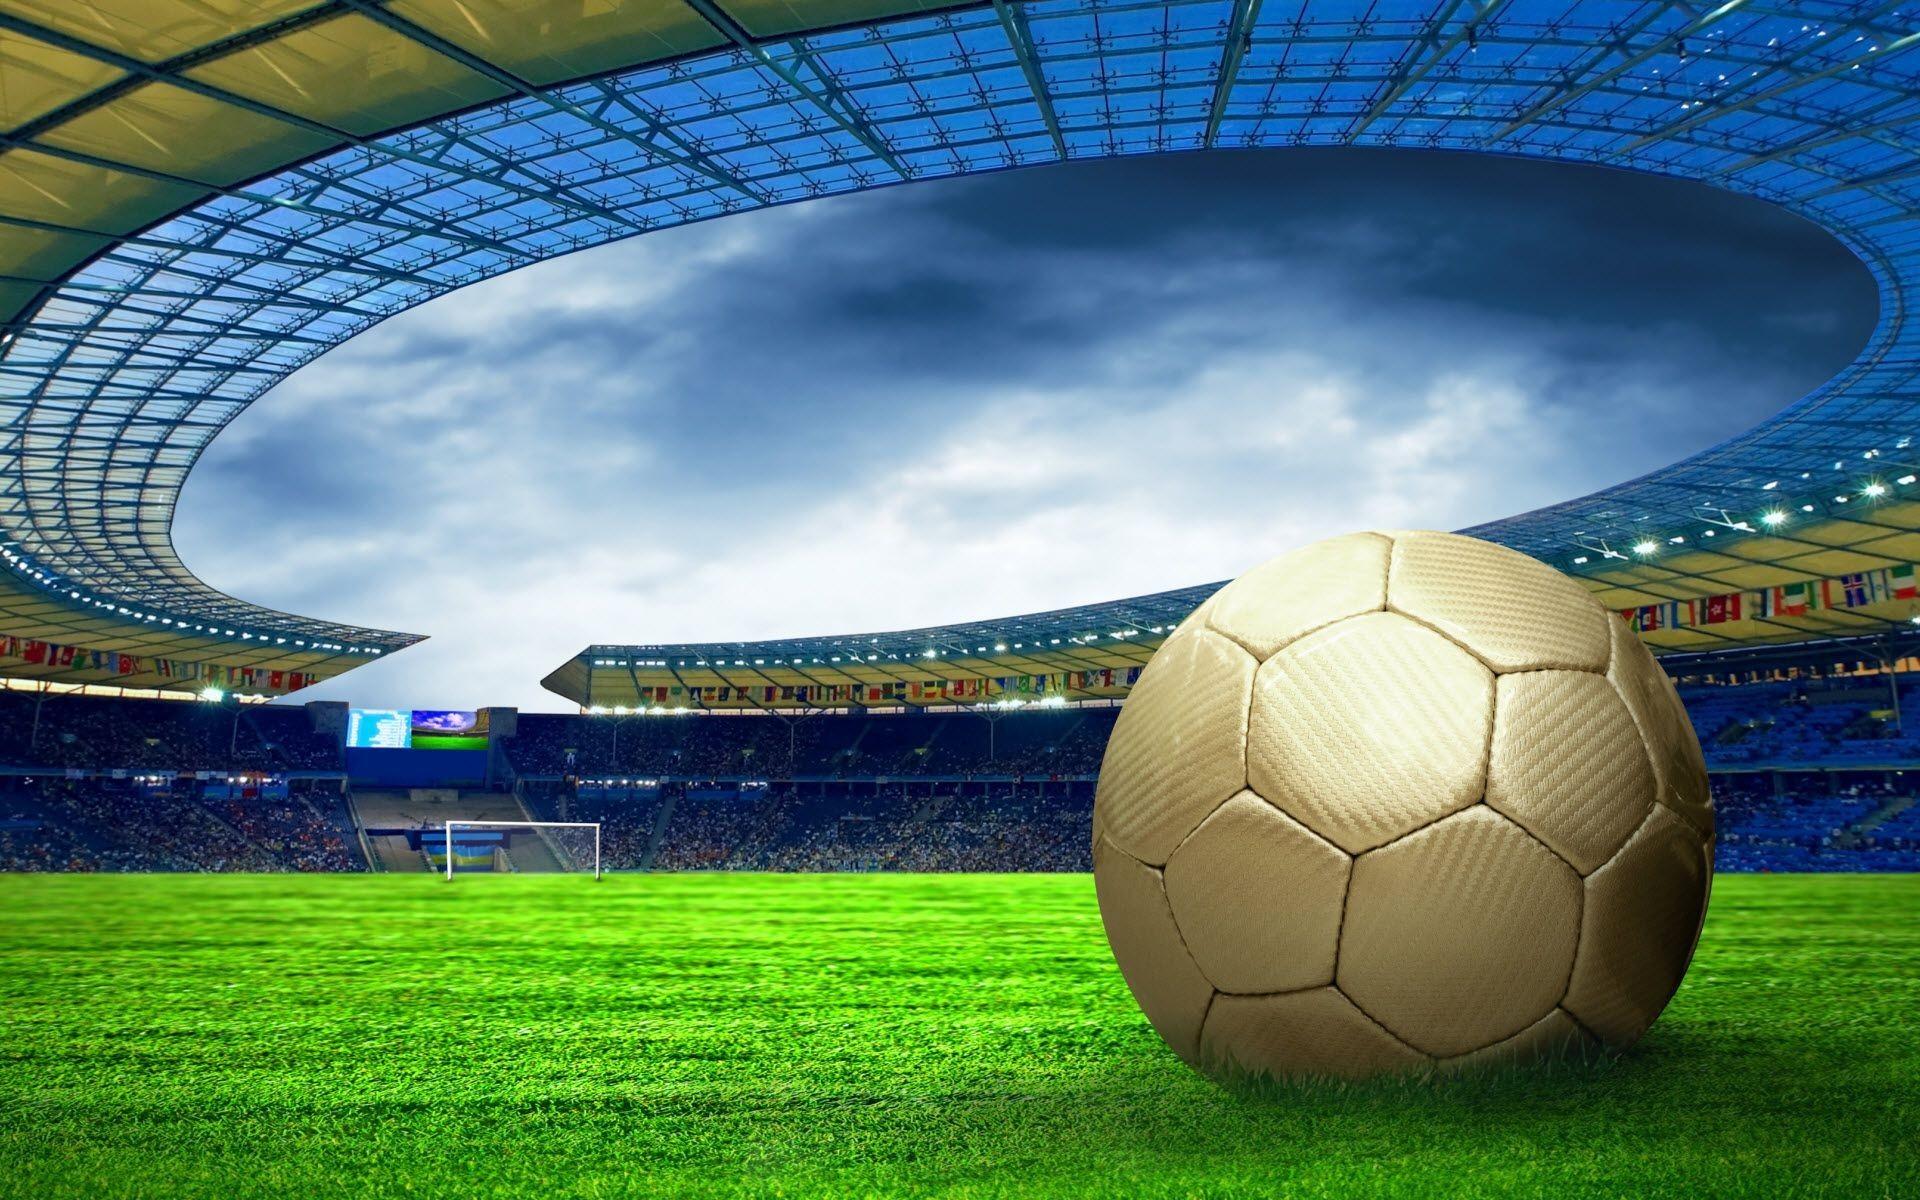 … The Best Football Stadium Wallpaper Full HD Desktop Wallpapers  1920×1080 Free Download Football Stadium